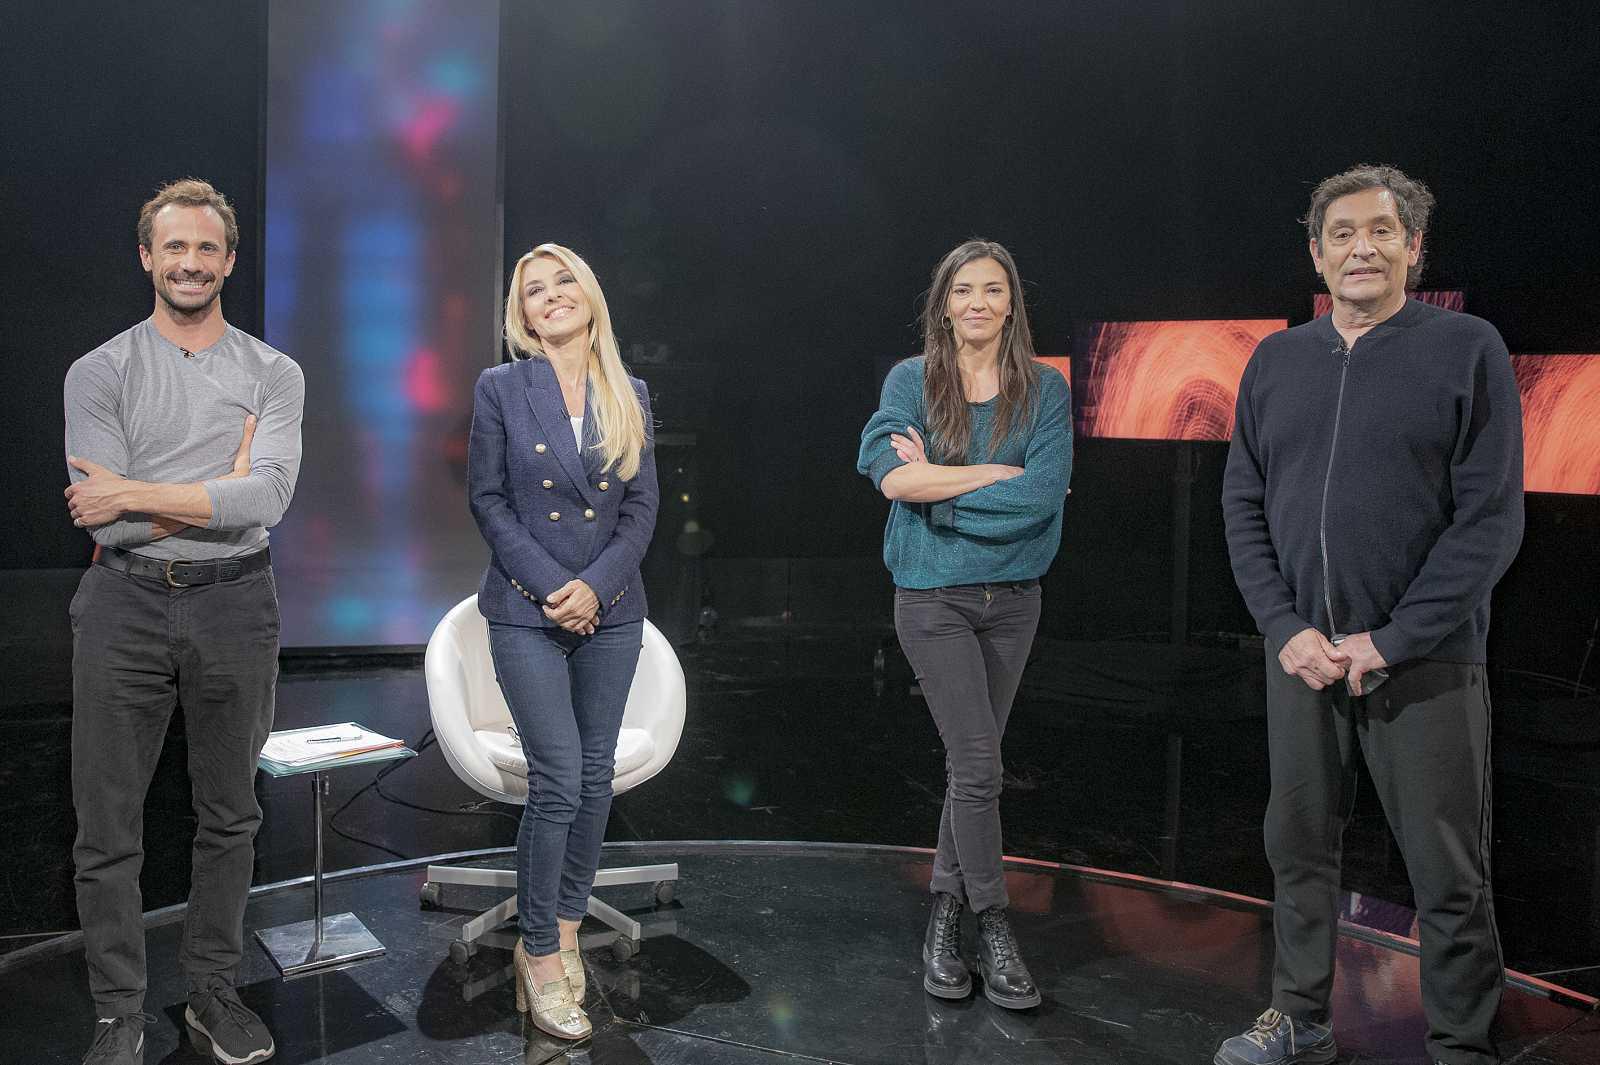 Agustí Villaronga, Nuria Prims y Oriol Pla, con Cayetana Guillén Cuervo